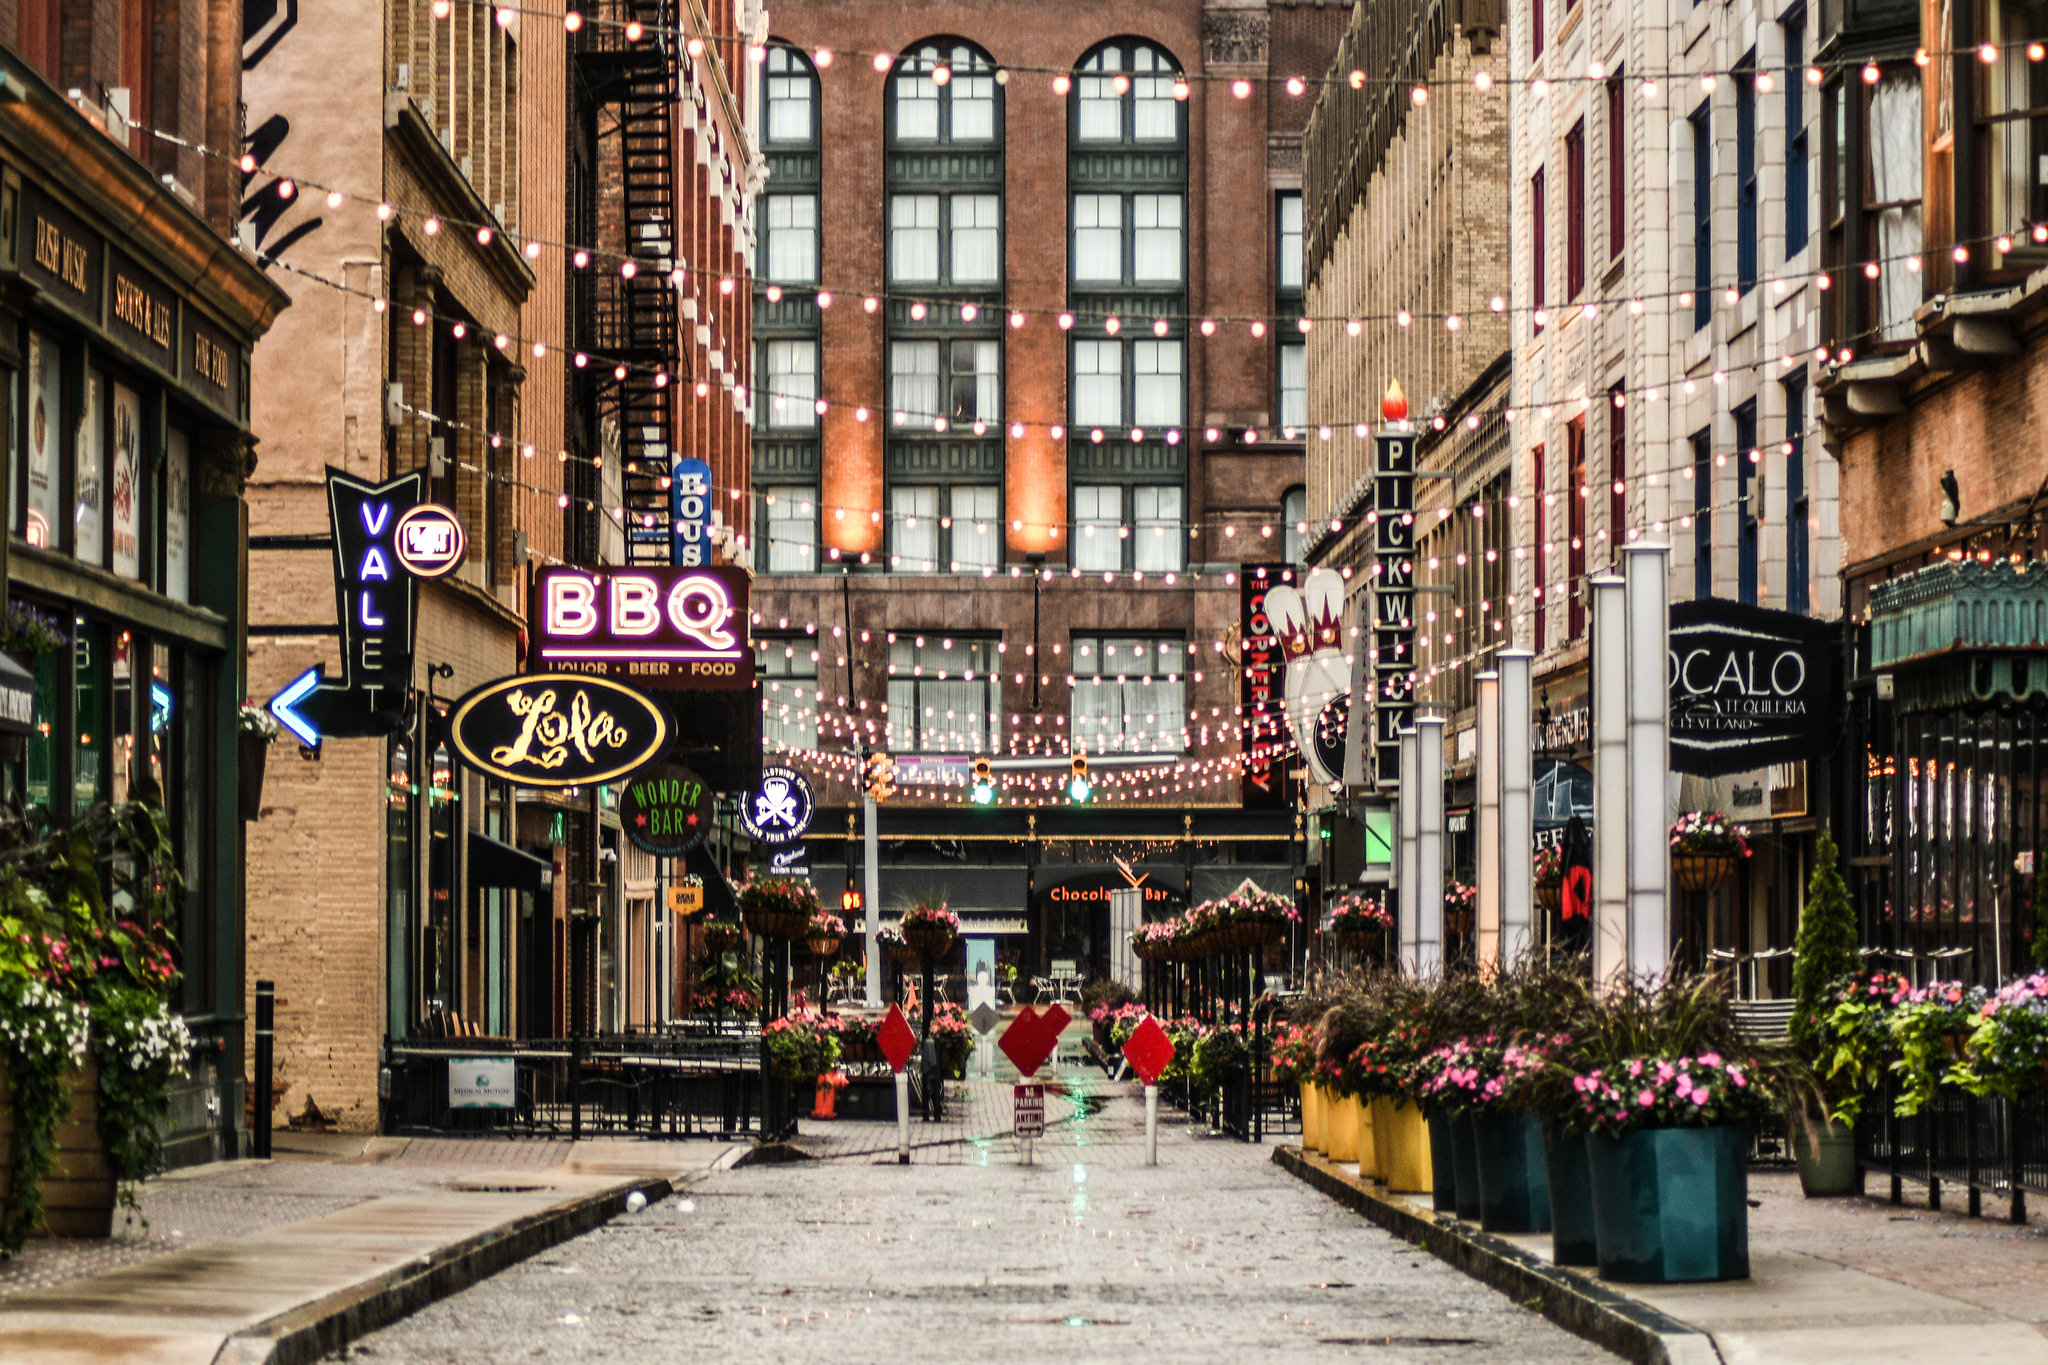 The 10 Best Romantic Restaurants In Cleveland